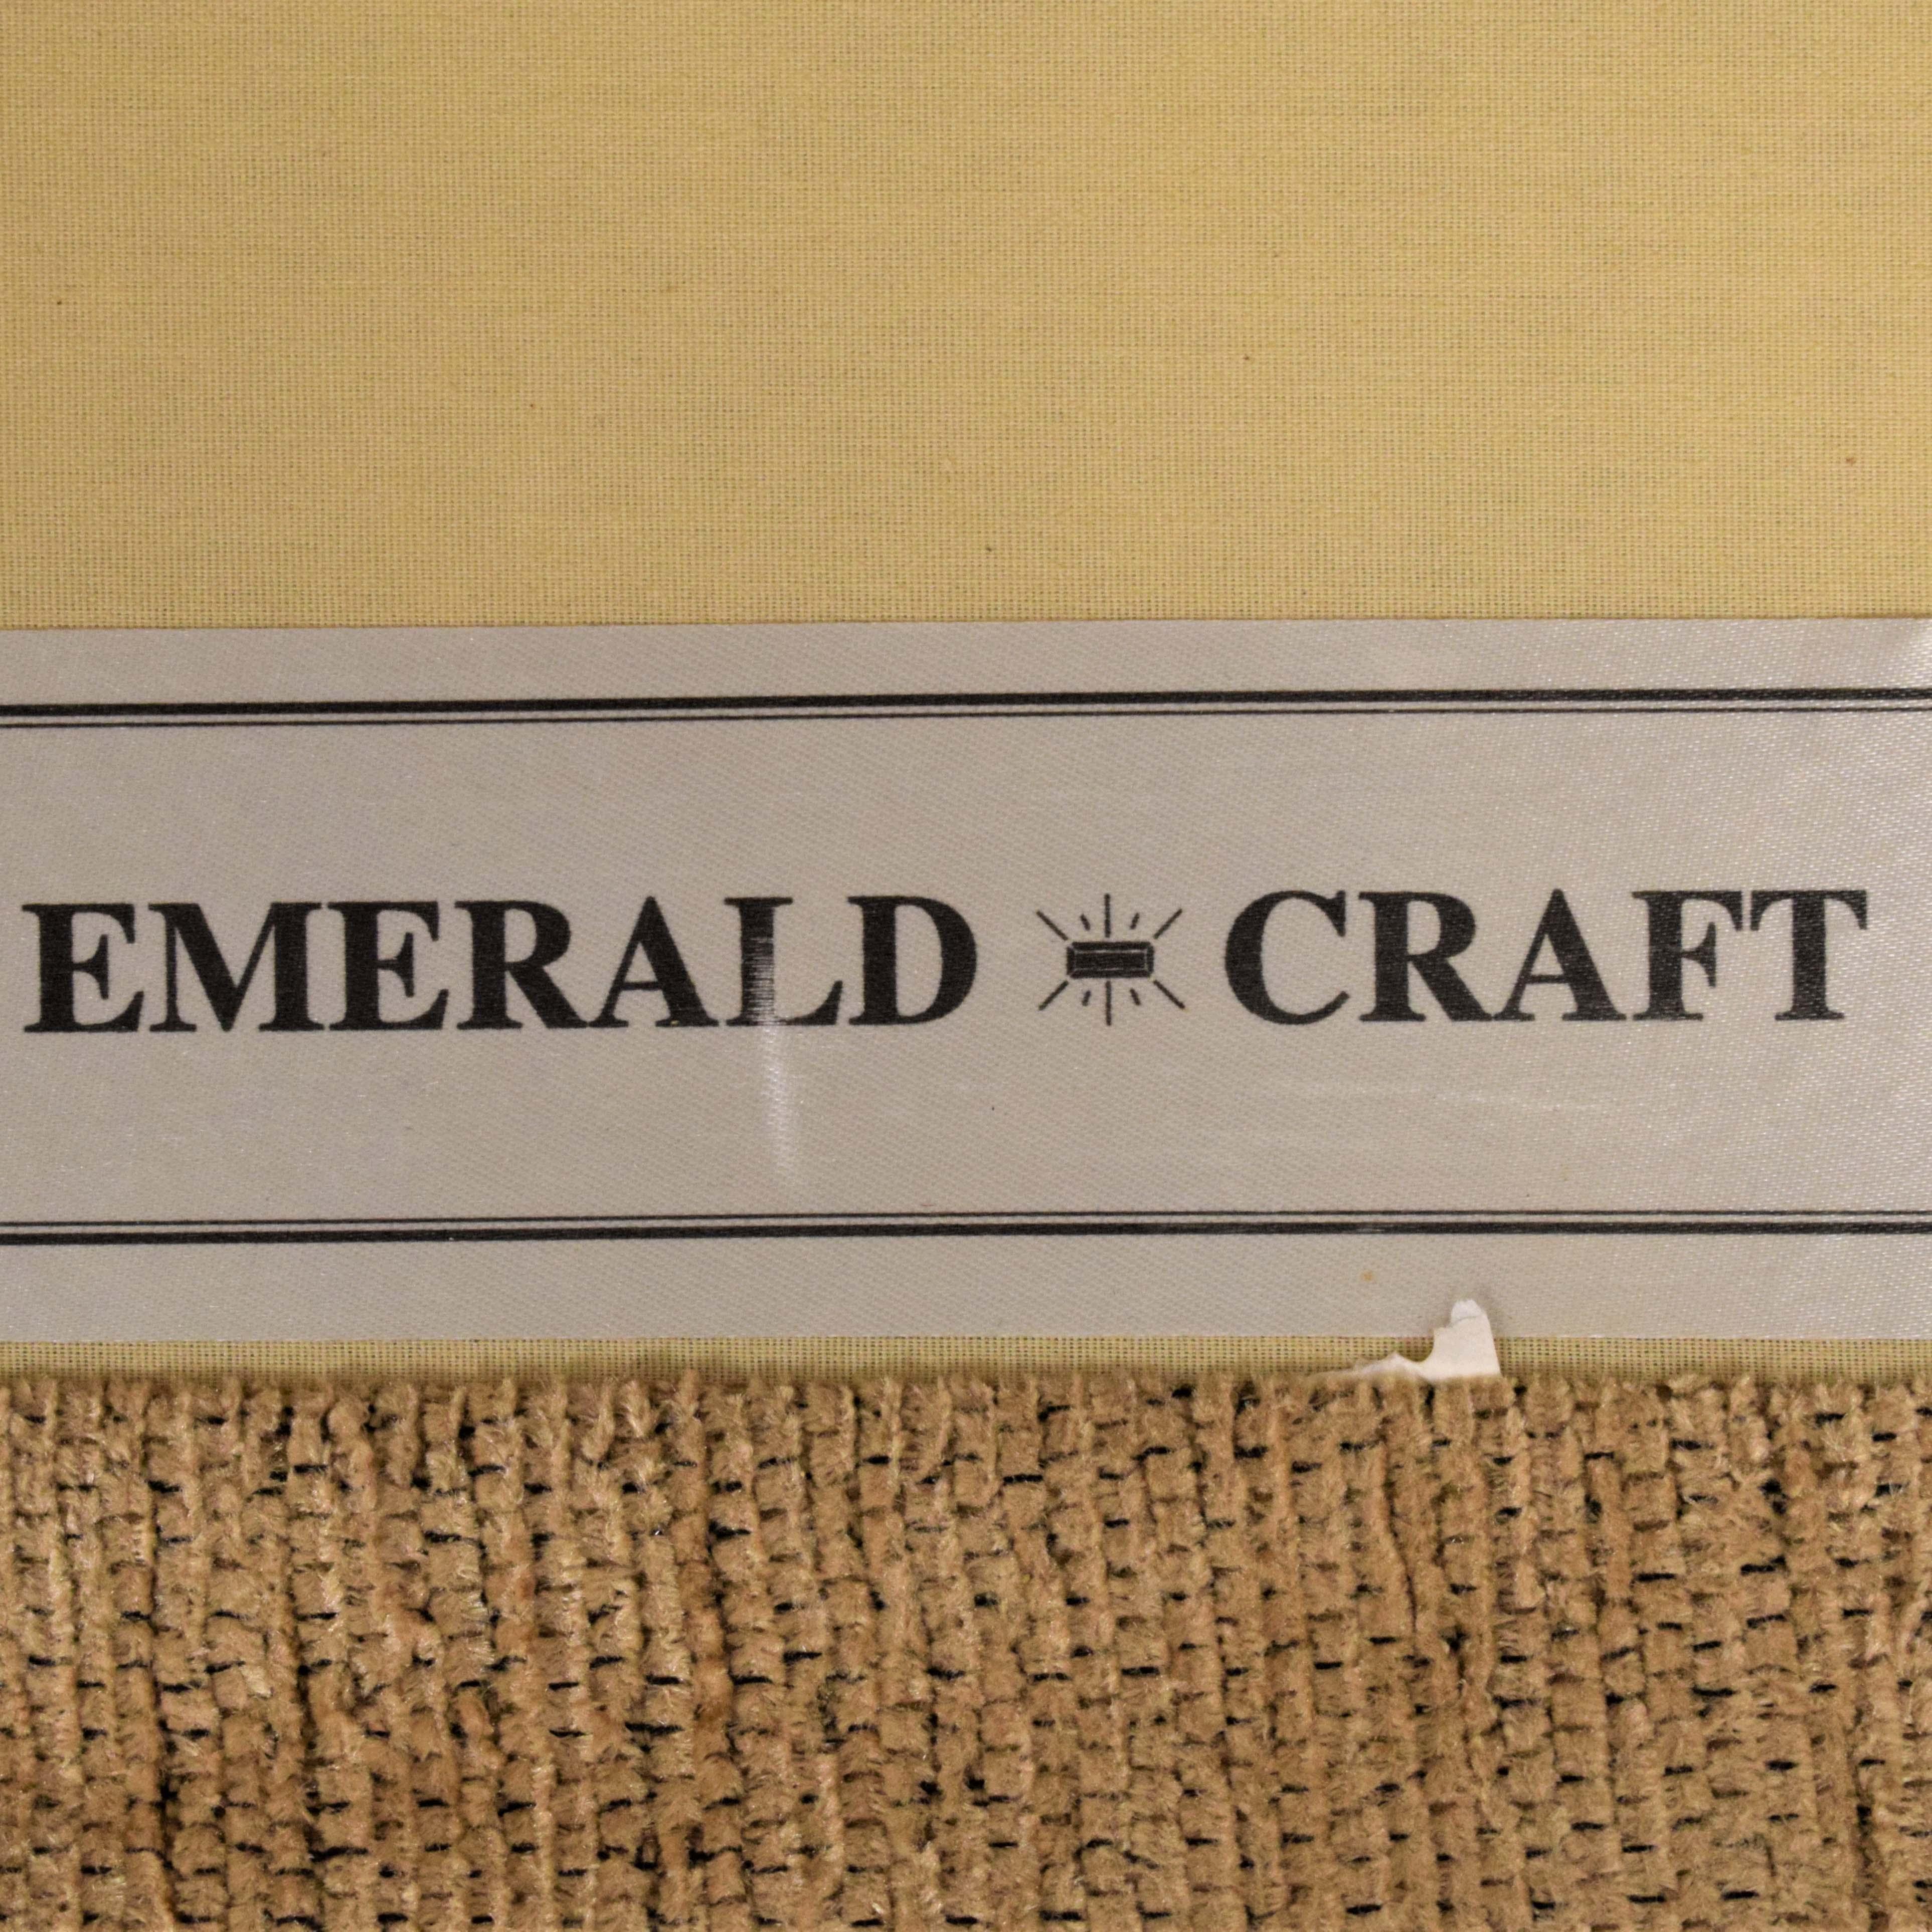 Emerald Home Furnishings Emerald Craft Loveseat coupon